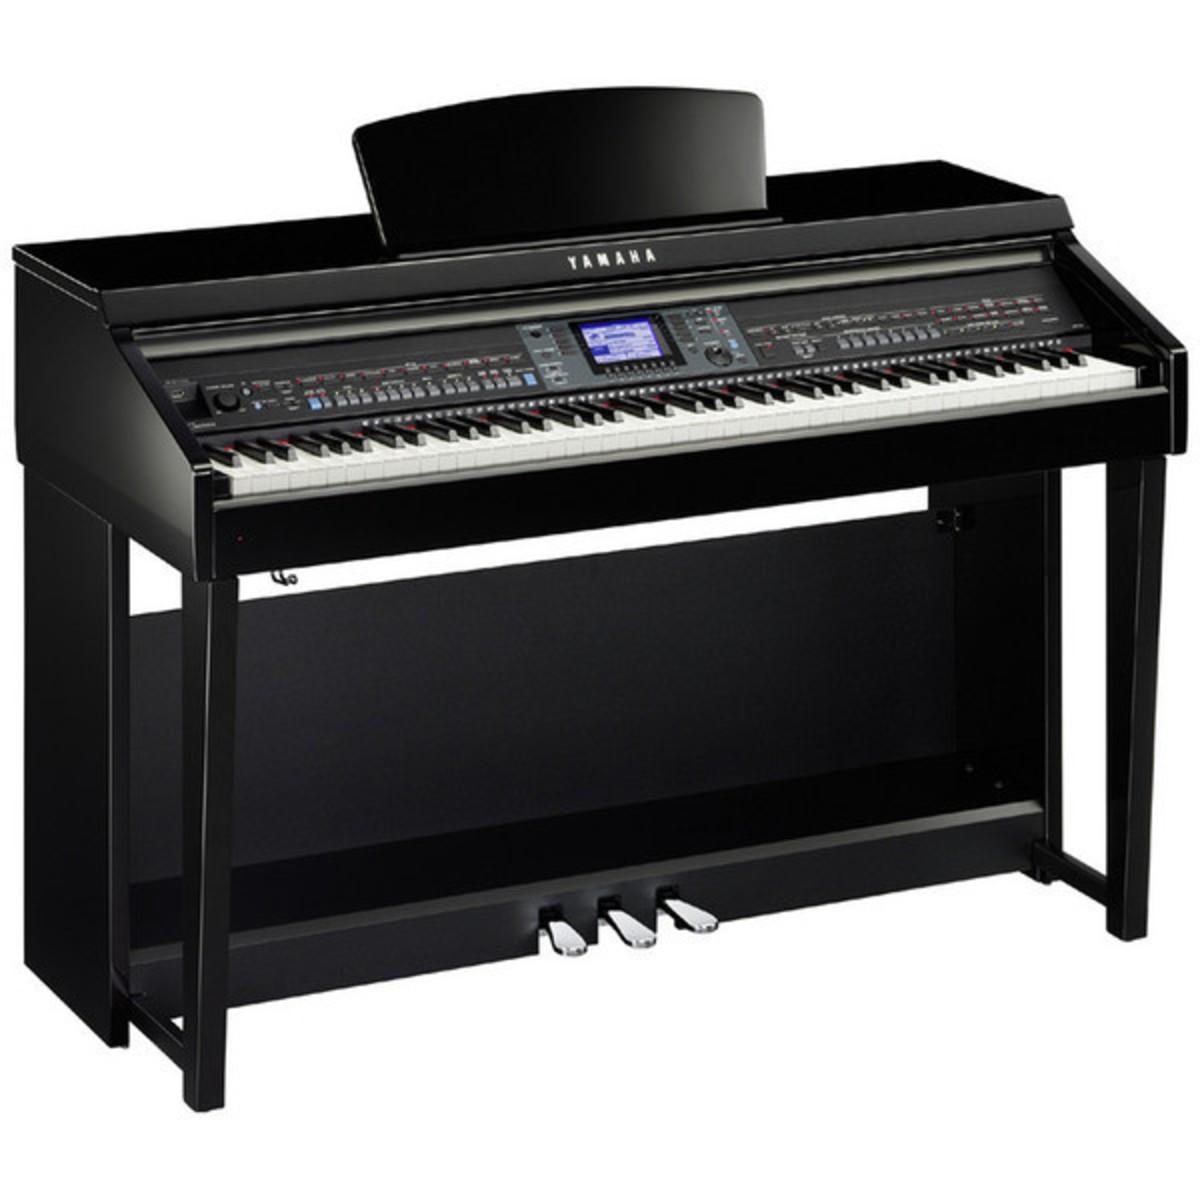 Disc yamaha clavinova cvp601 digital piano polished ebony for Yamaha digital piano clavinova